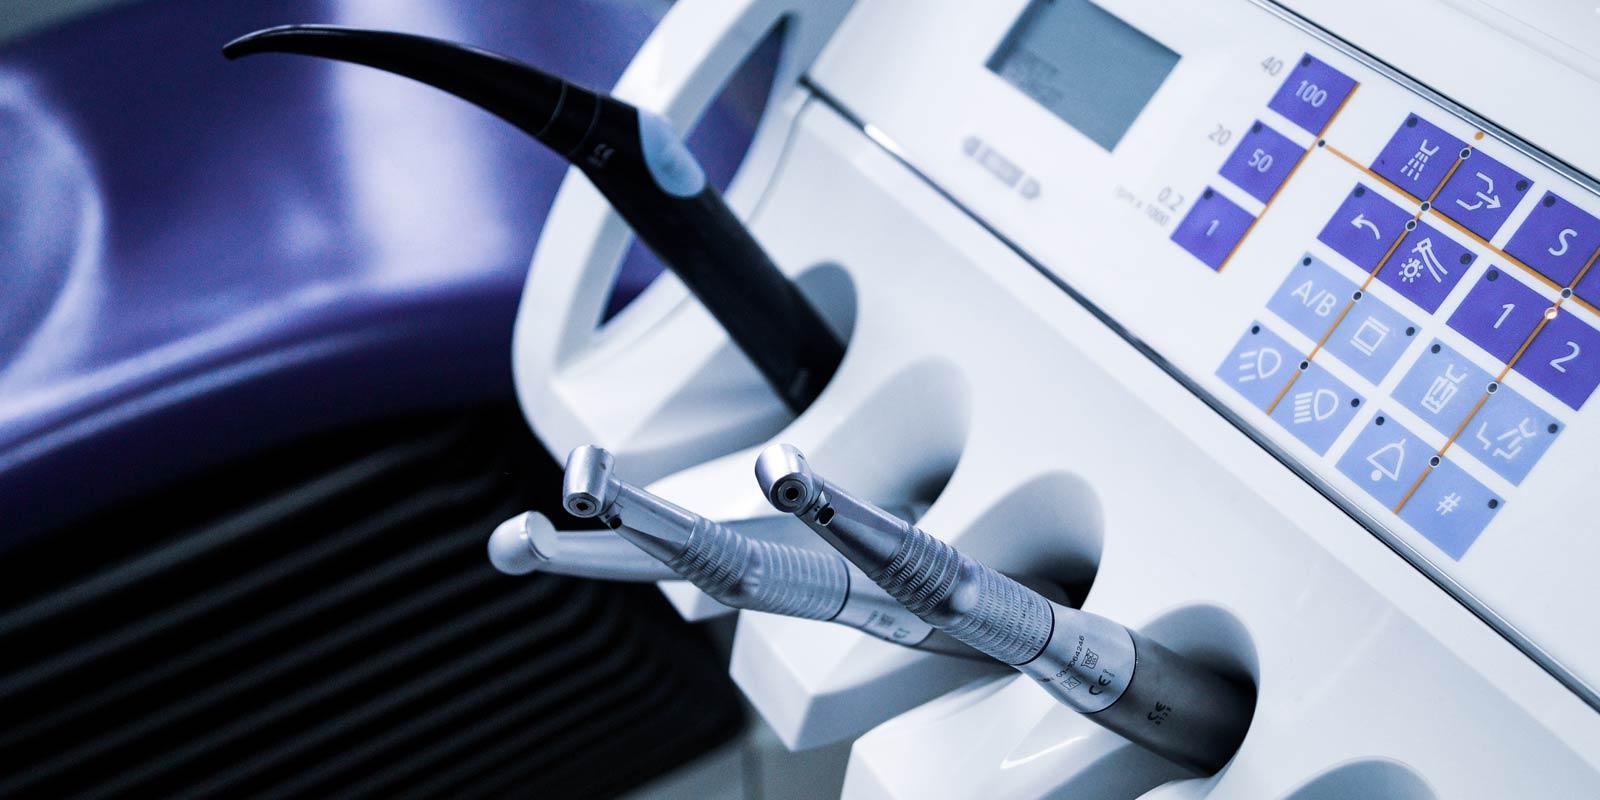 studio-dentistico-dottor-gola-casteggio-odontoiatria-pavia-dentista-implantologia-ortodonzia-protesi-chirurgia-47